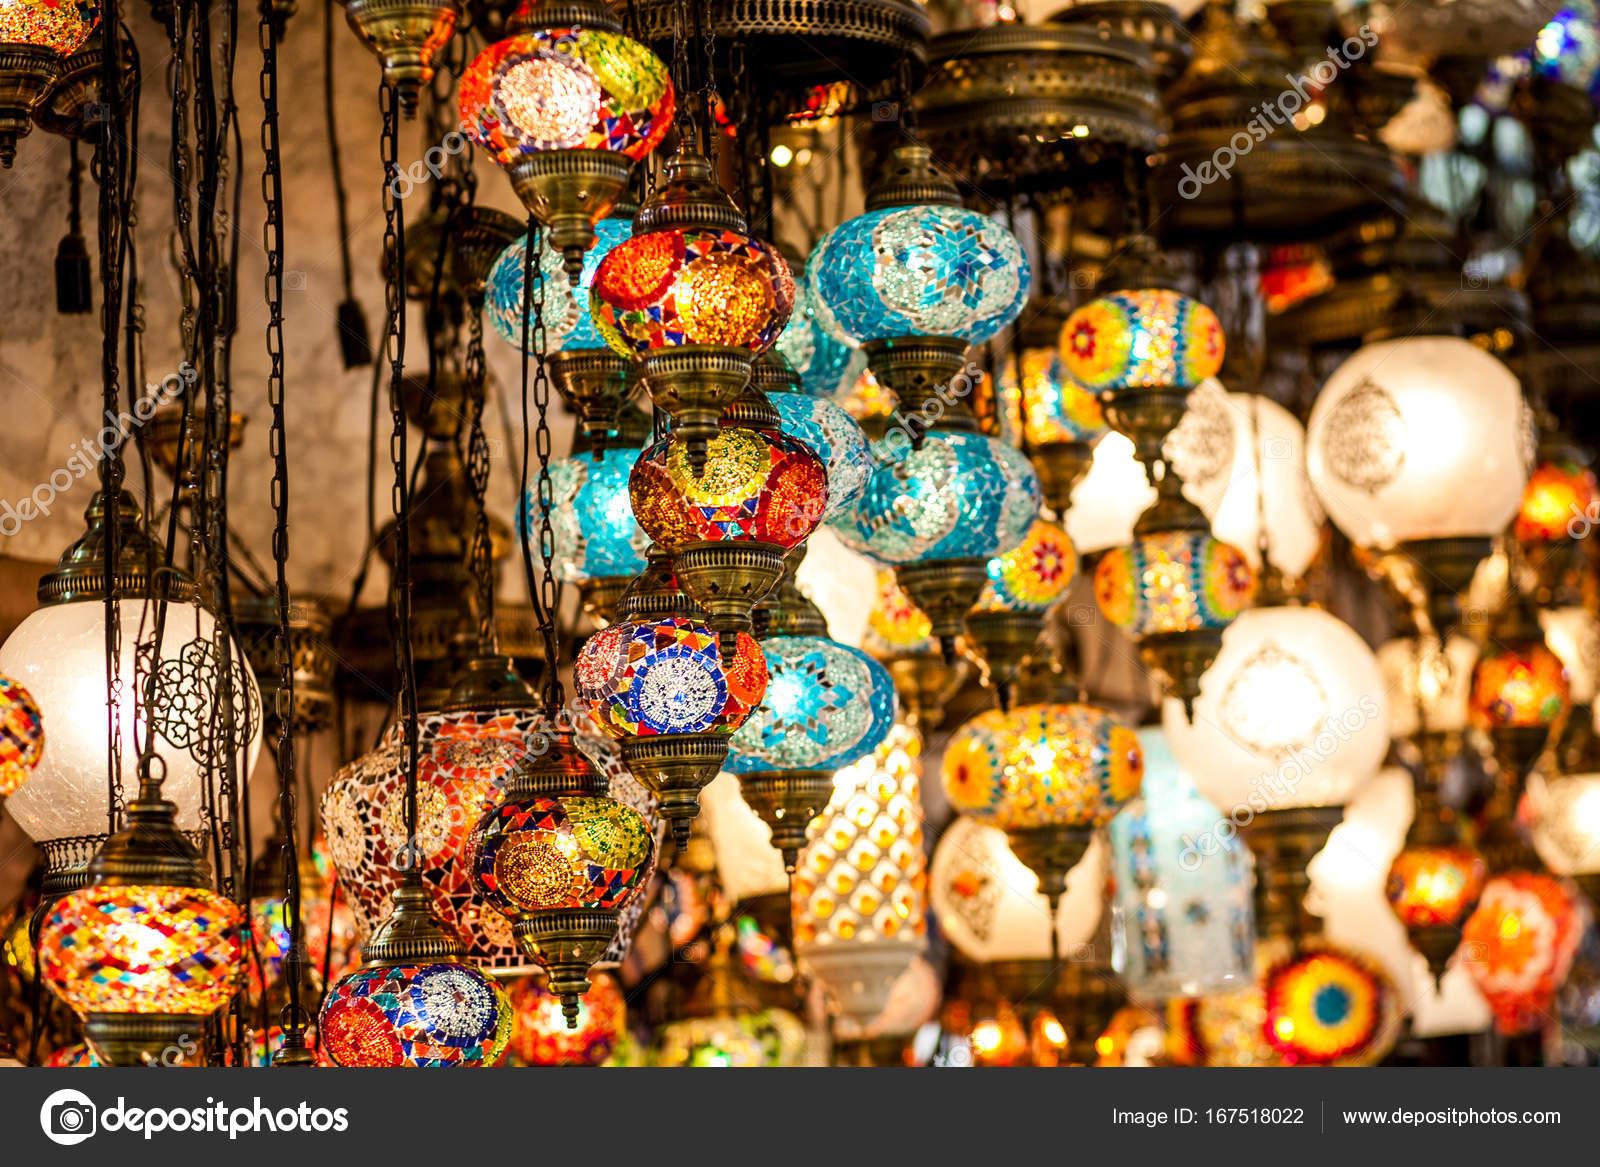 Lanterne Lampade Orientali Foto Stock C A Ostankova 167518022